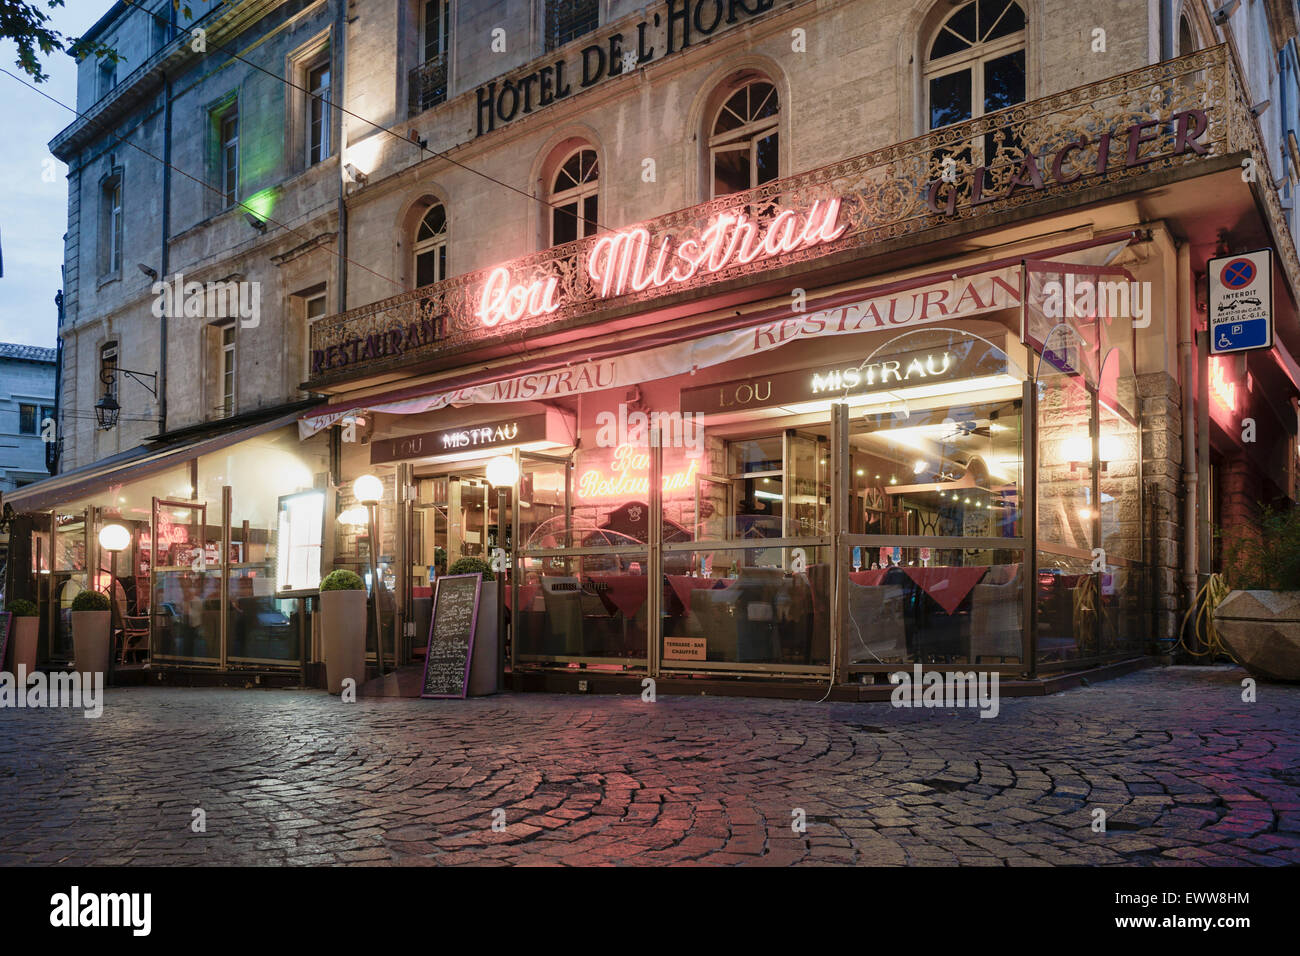 Straße Cafe, Restaurant, Place De La Horloge, Avignon, Bouche du Rhone, Frankreich Stockbild